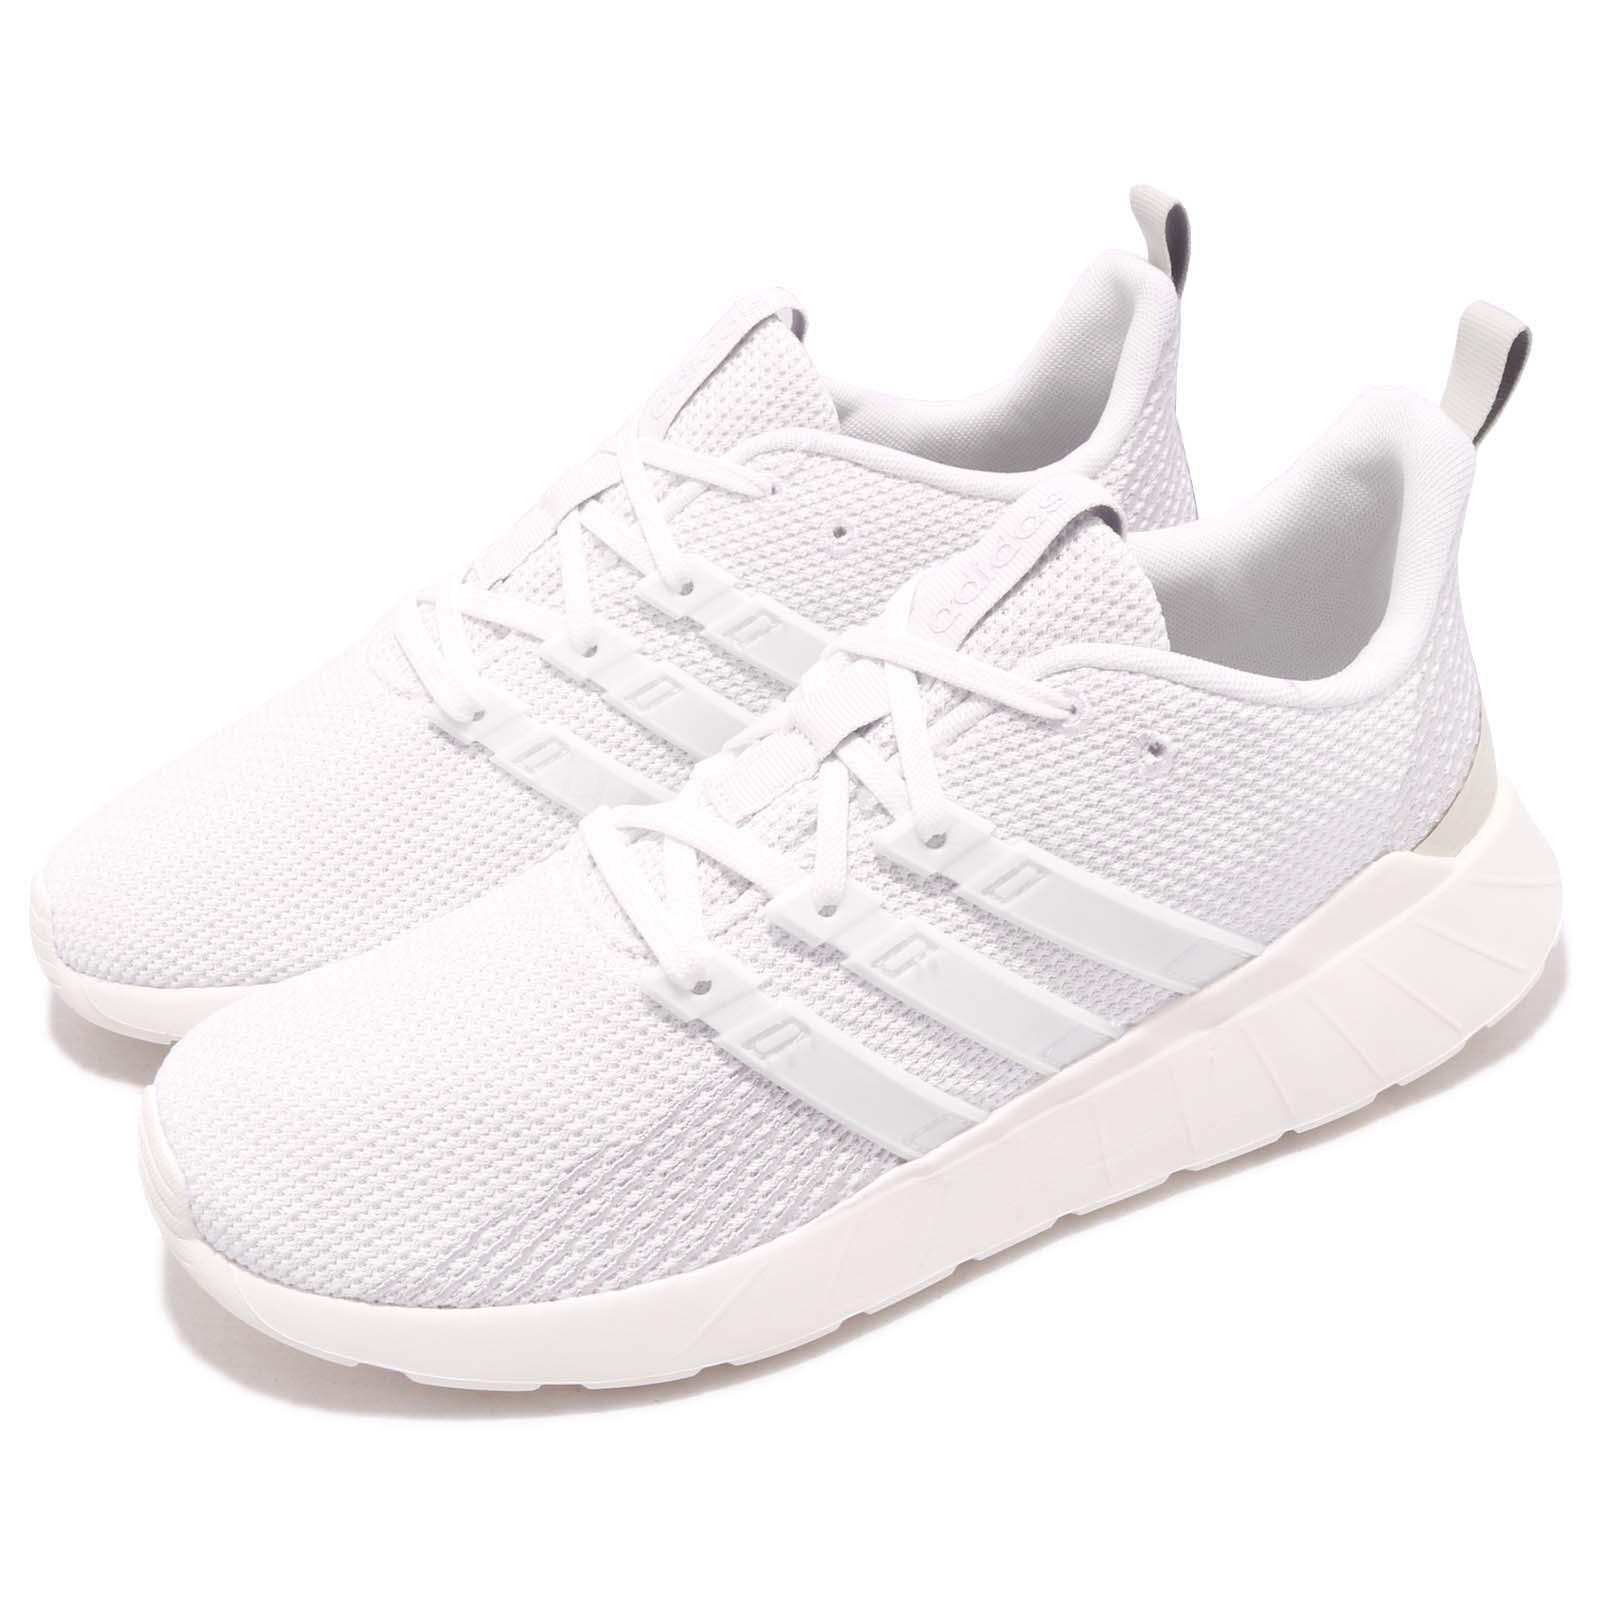 431e31c39925e Adidas Neo Raw White Men Running Casual shoes Sneakers F36256 Questar Flow  nouoli9067-Men